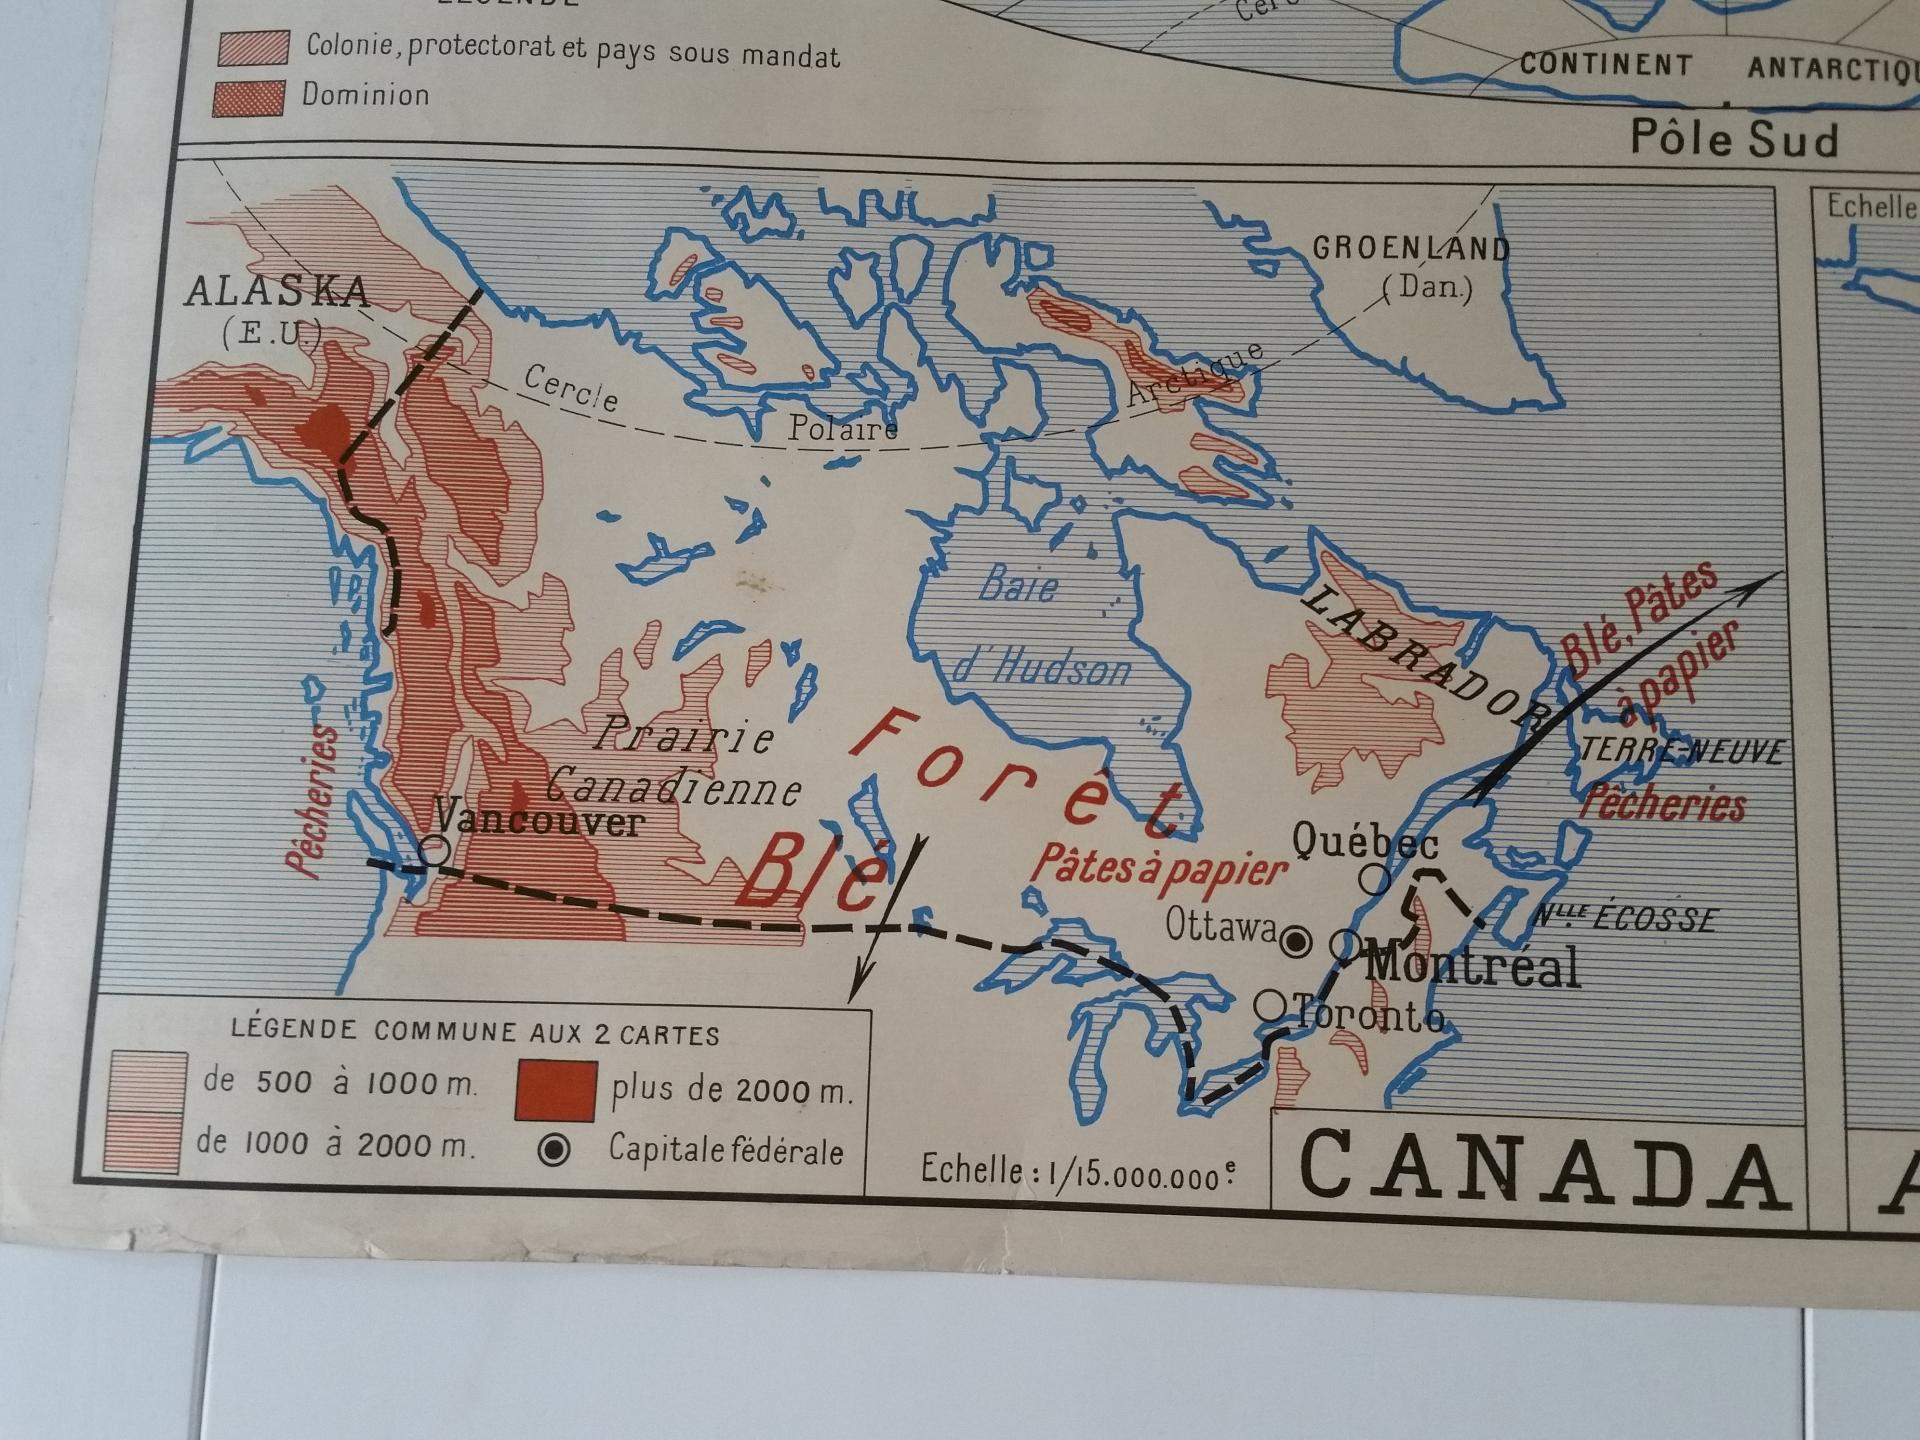 3 carte union francaise empire britanique canada australie